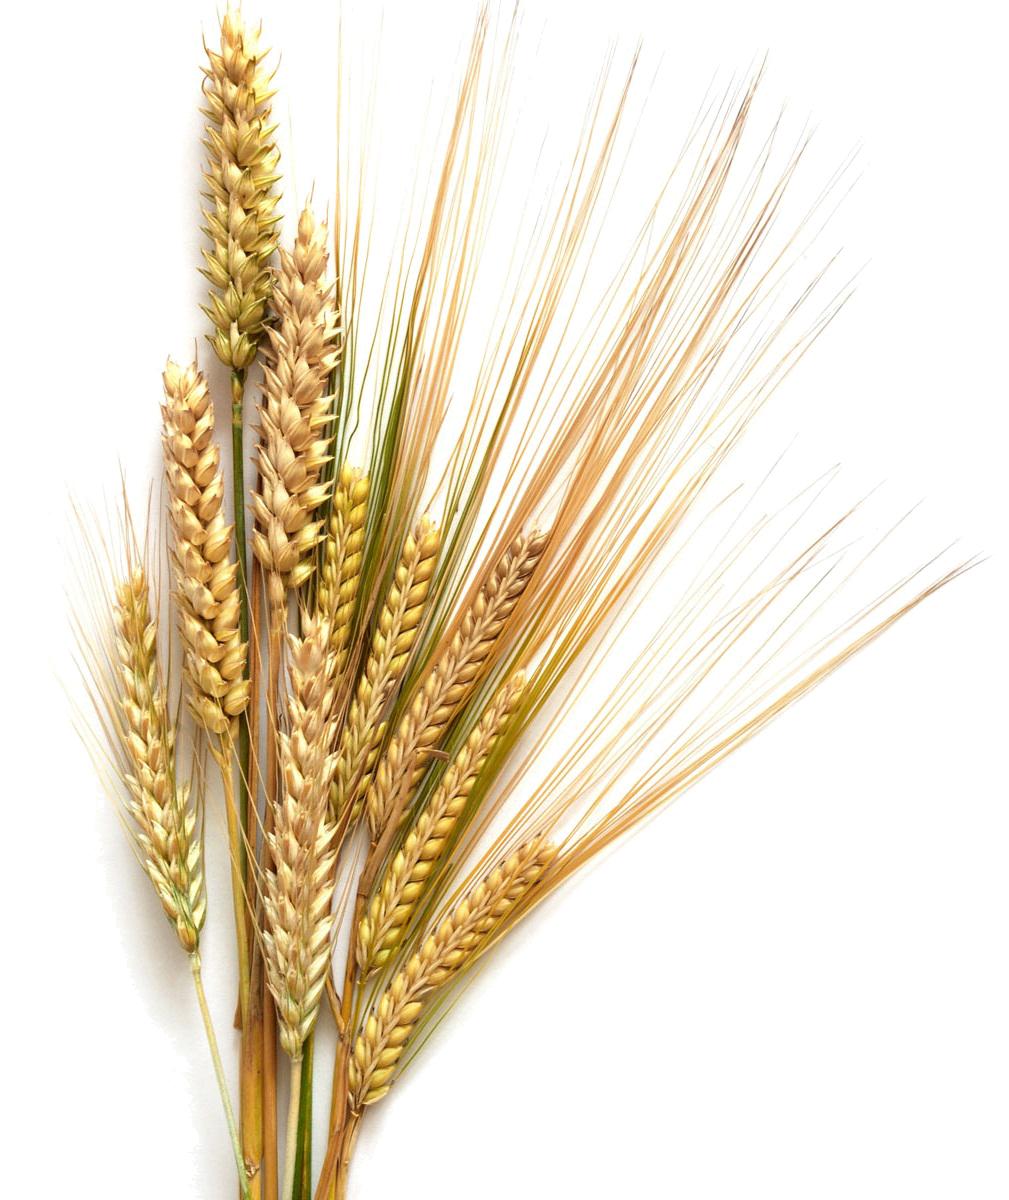 Grains clipart transparent background wheat. Barley distillery design ideas